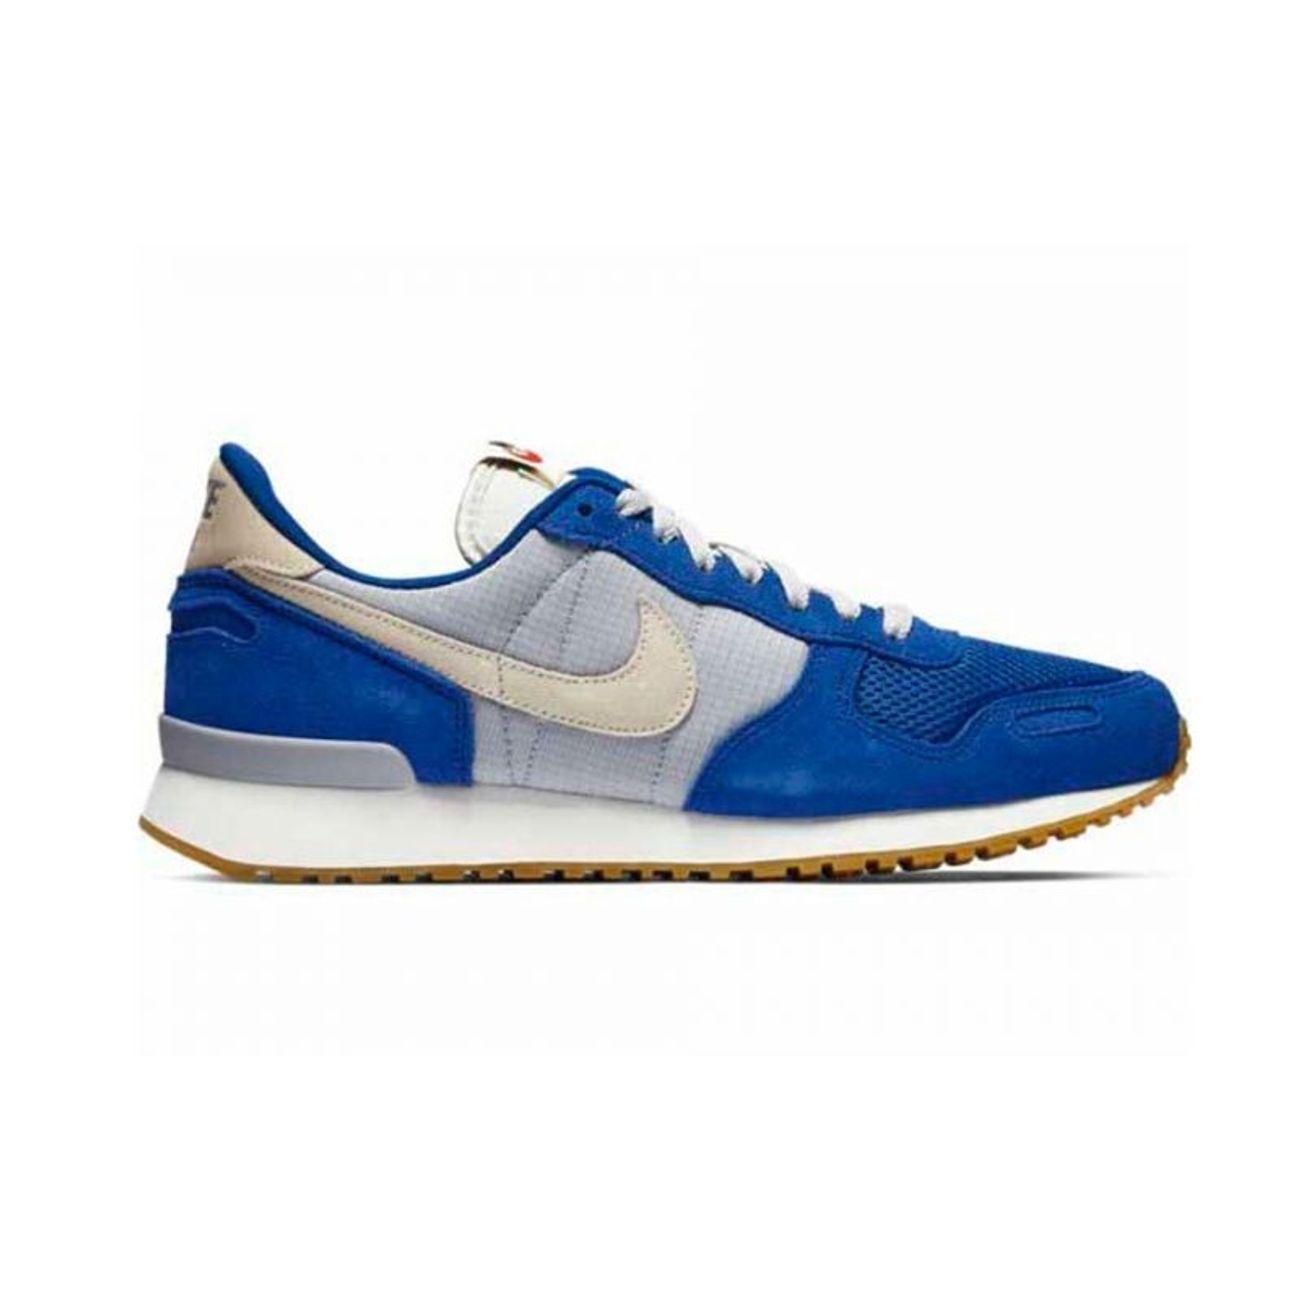 Air Nike 405 Gris Padel Adulte Vortex Bleu Ni903896 E29IYDHW